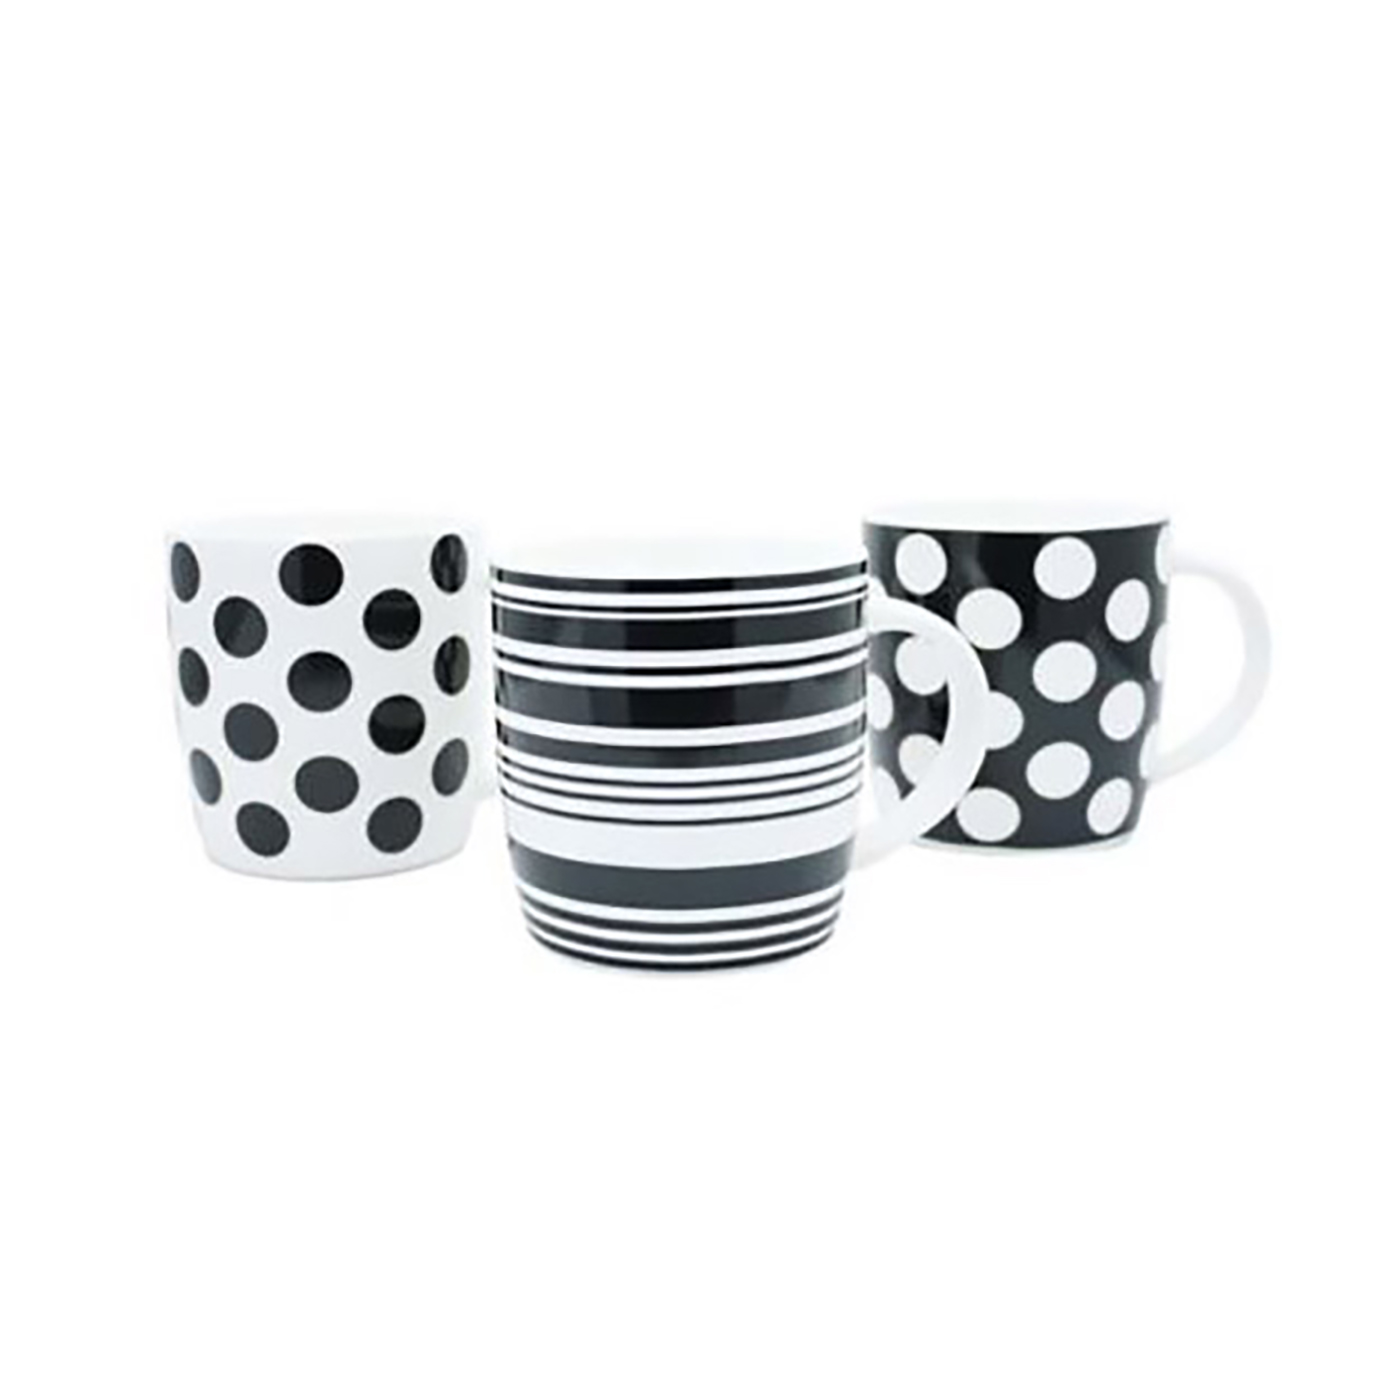 Squat Mugs Patterned 12oz Black & White Ref 0399290 [Pack 12]